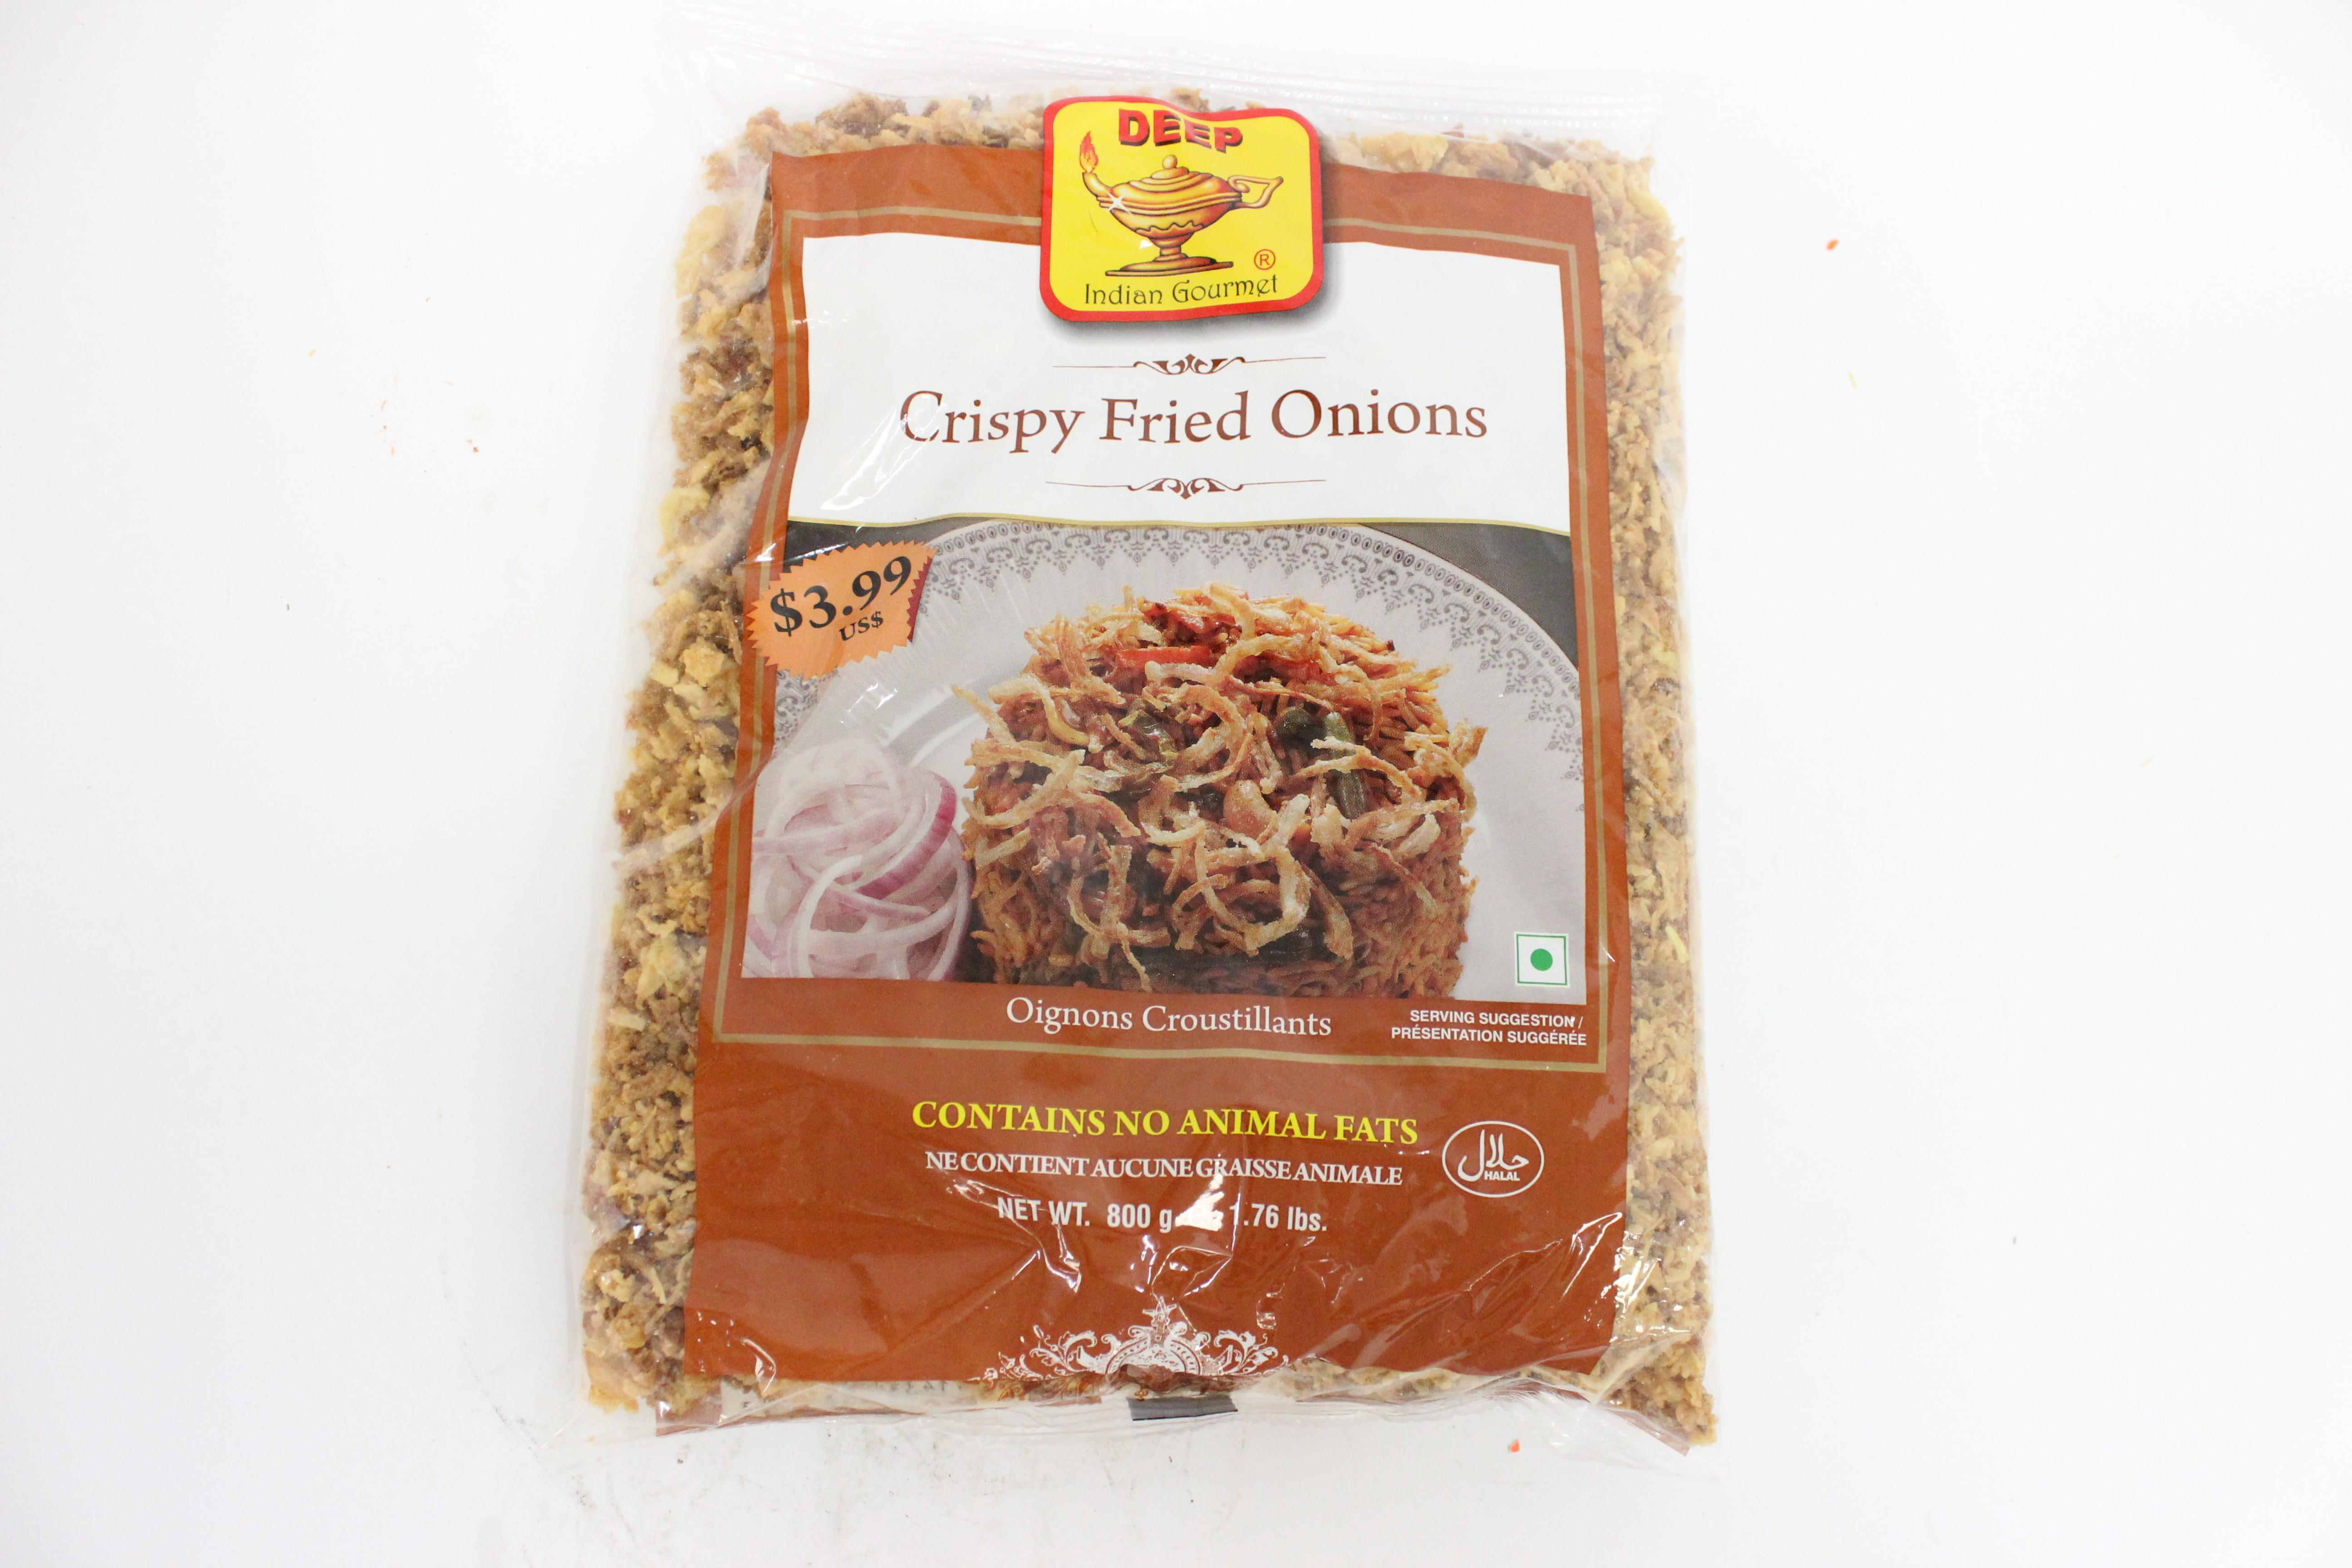 Deep Crispy Fried Onions 1.76 lbs